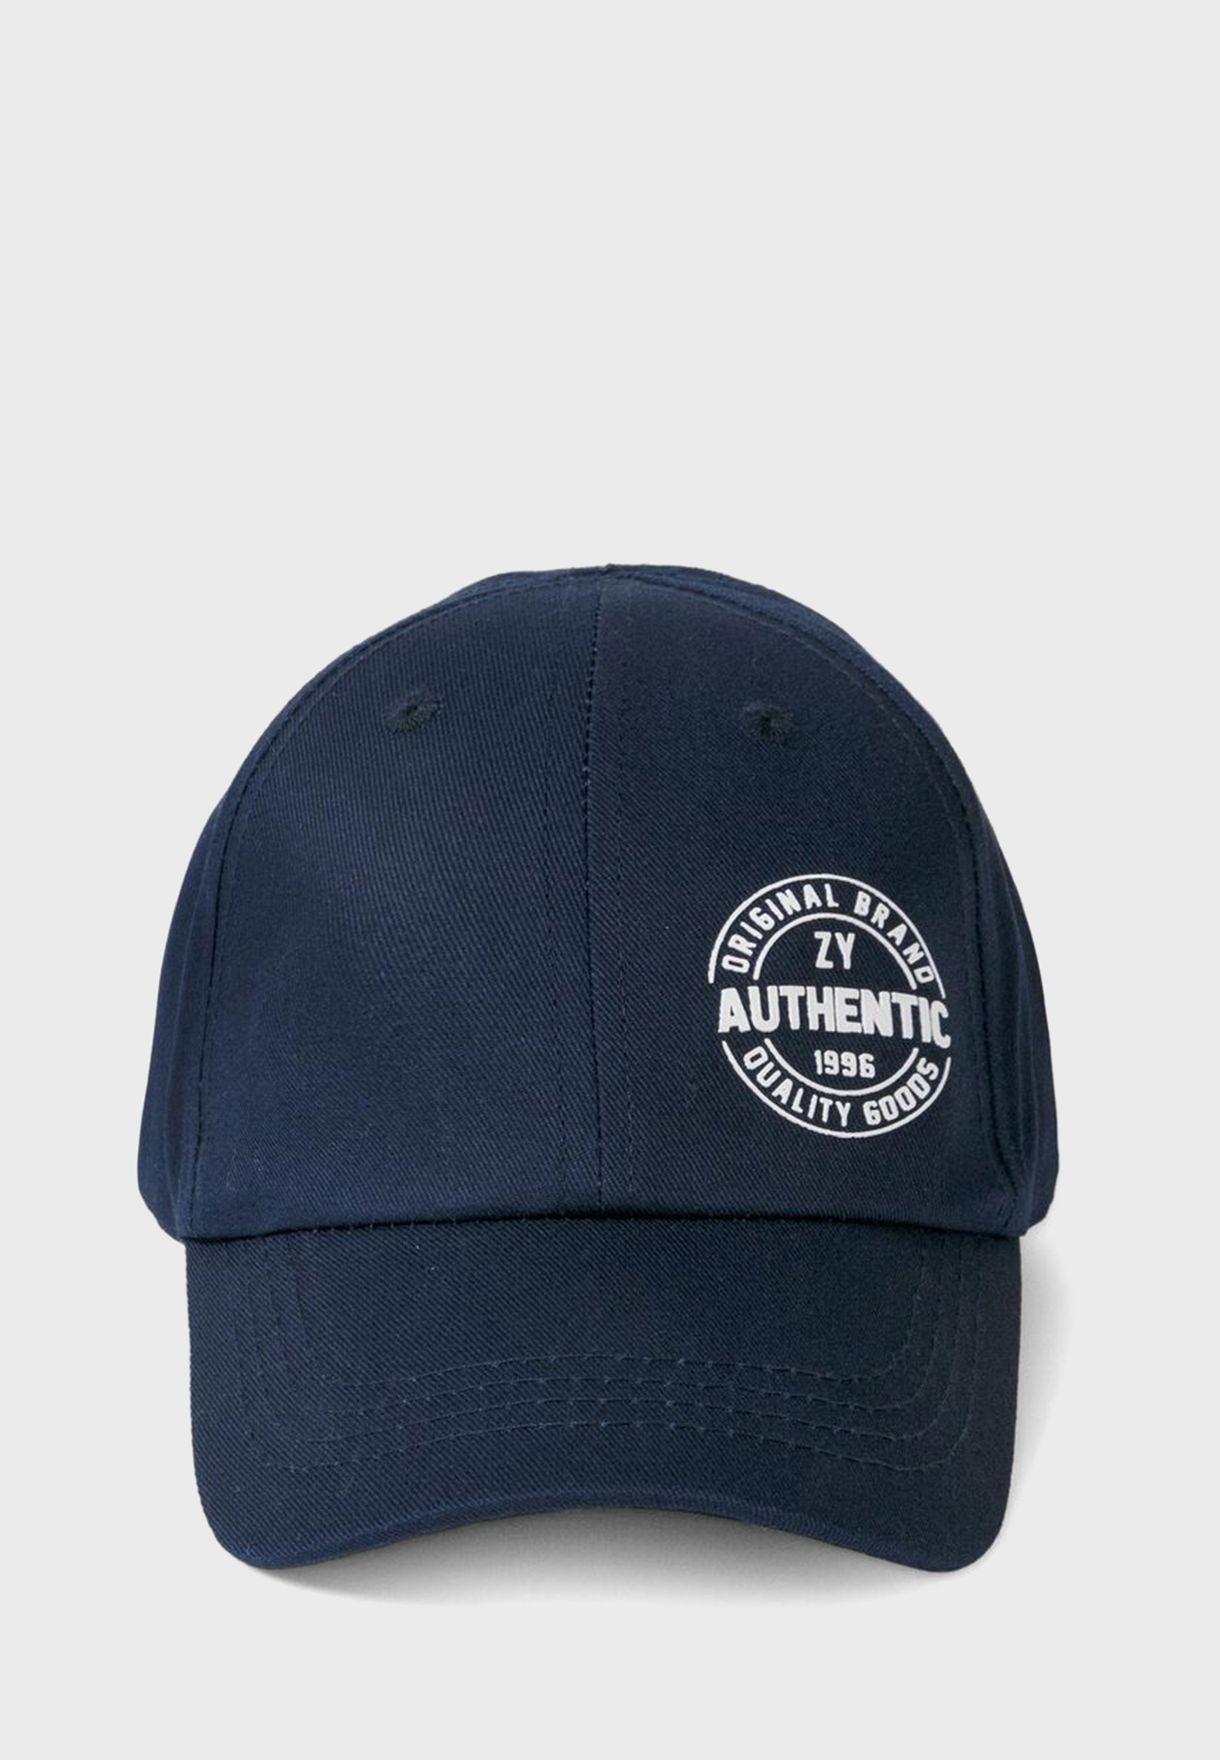 Kids Authentic Baseball Cap